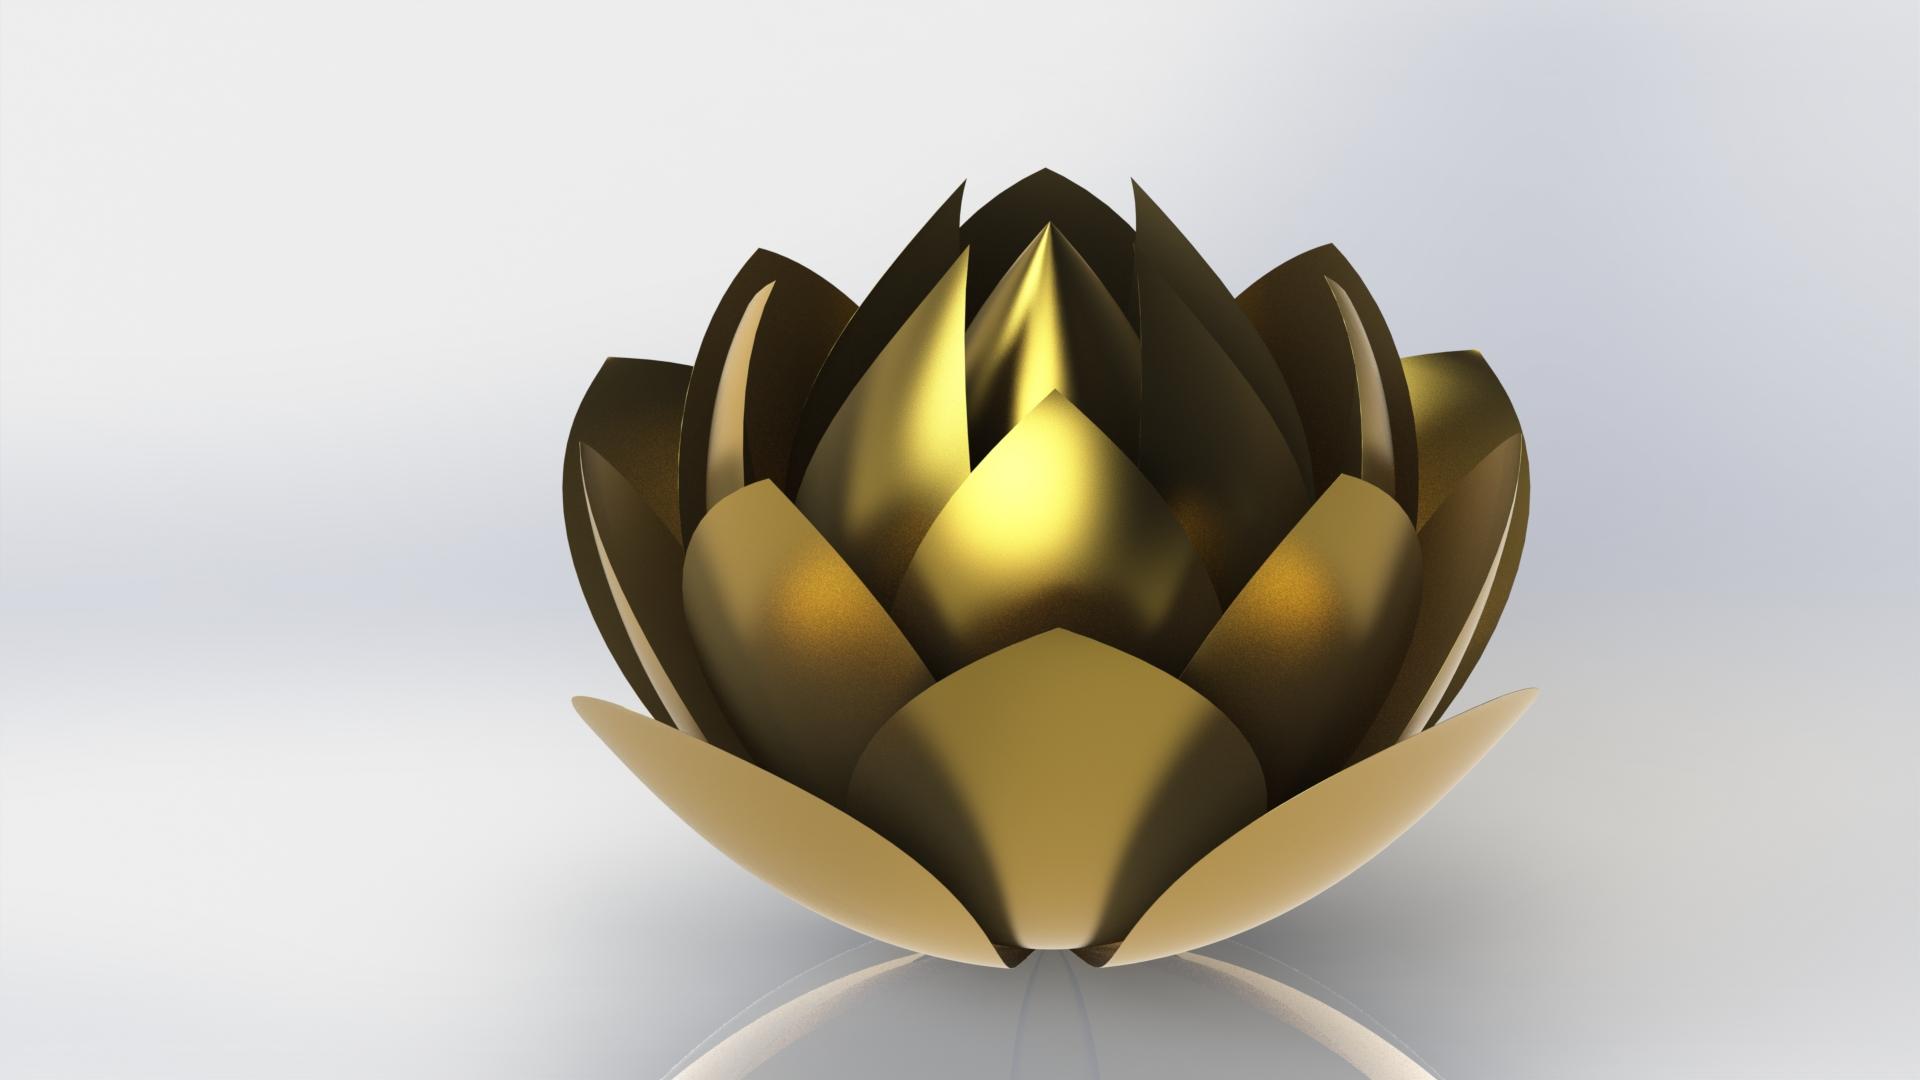 Sfondi desktop fiori 1920x1080